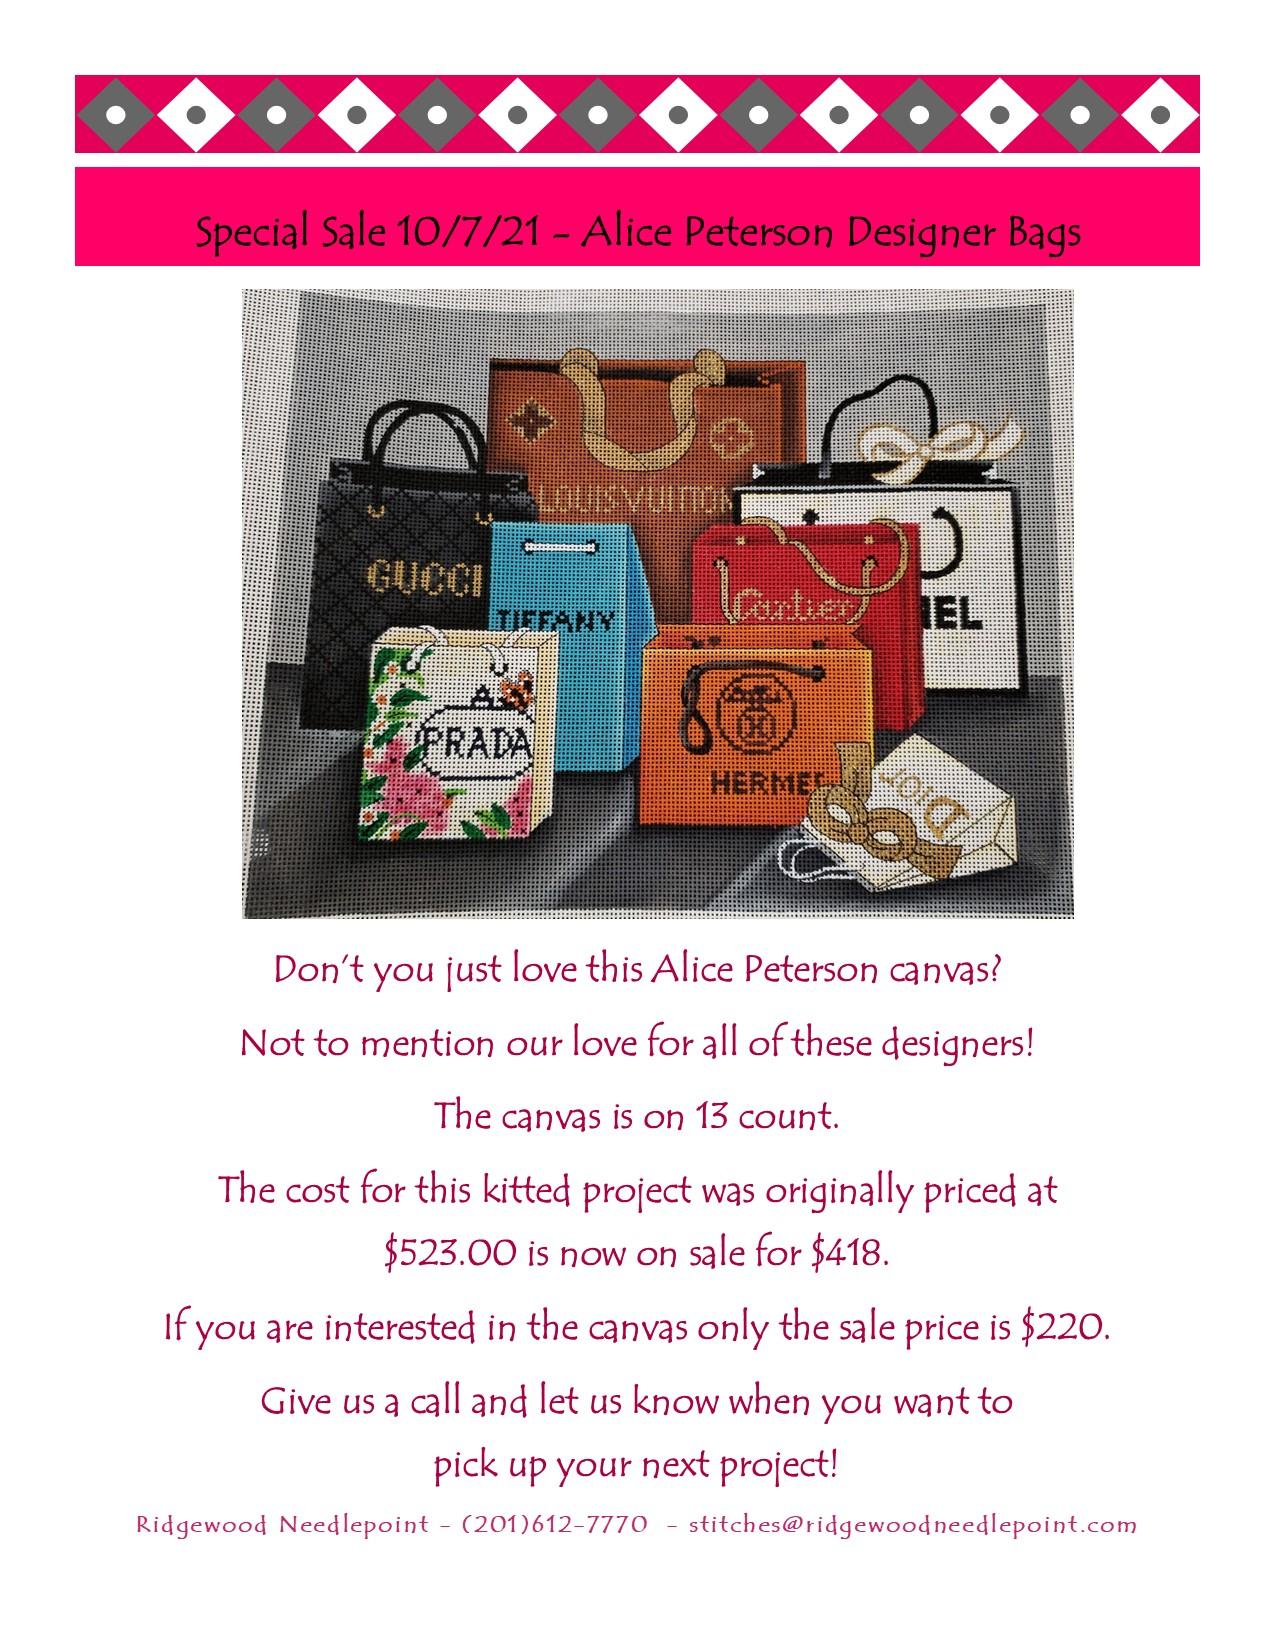 Alice Peterson Designer Bags 10-7-21